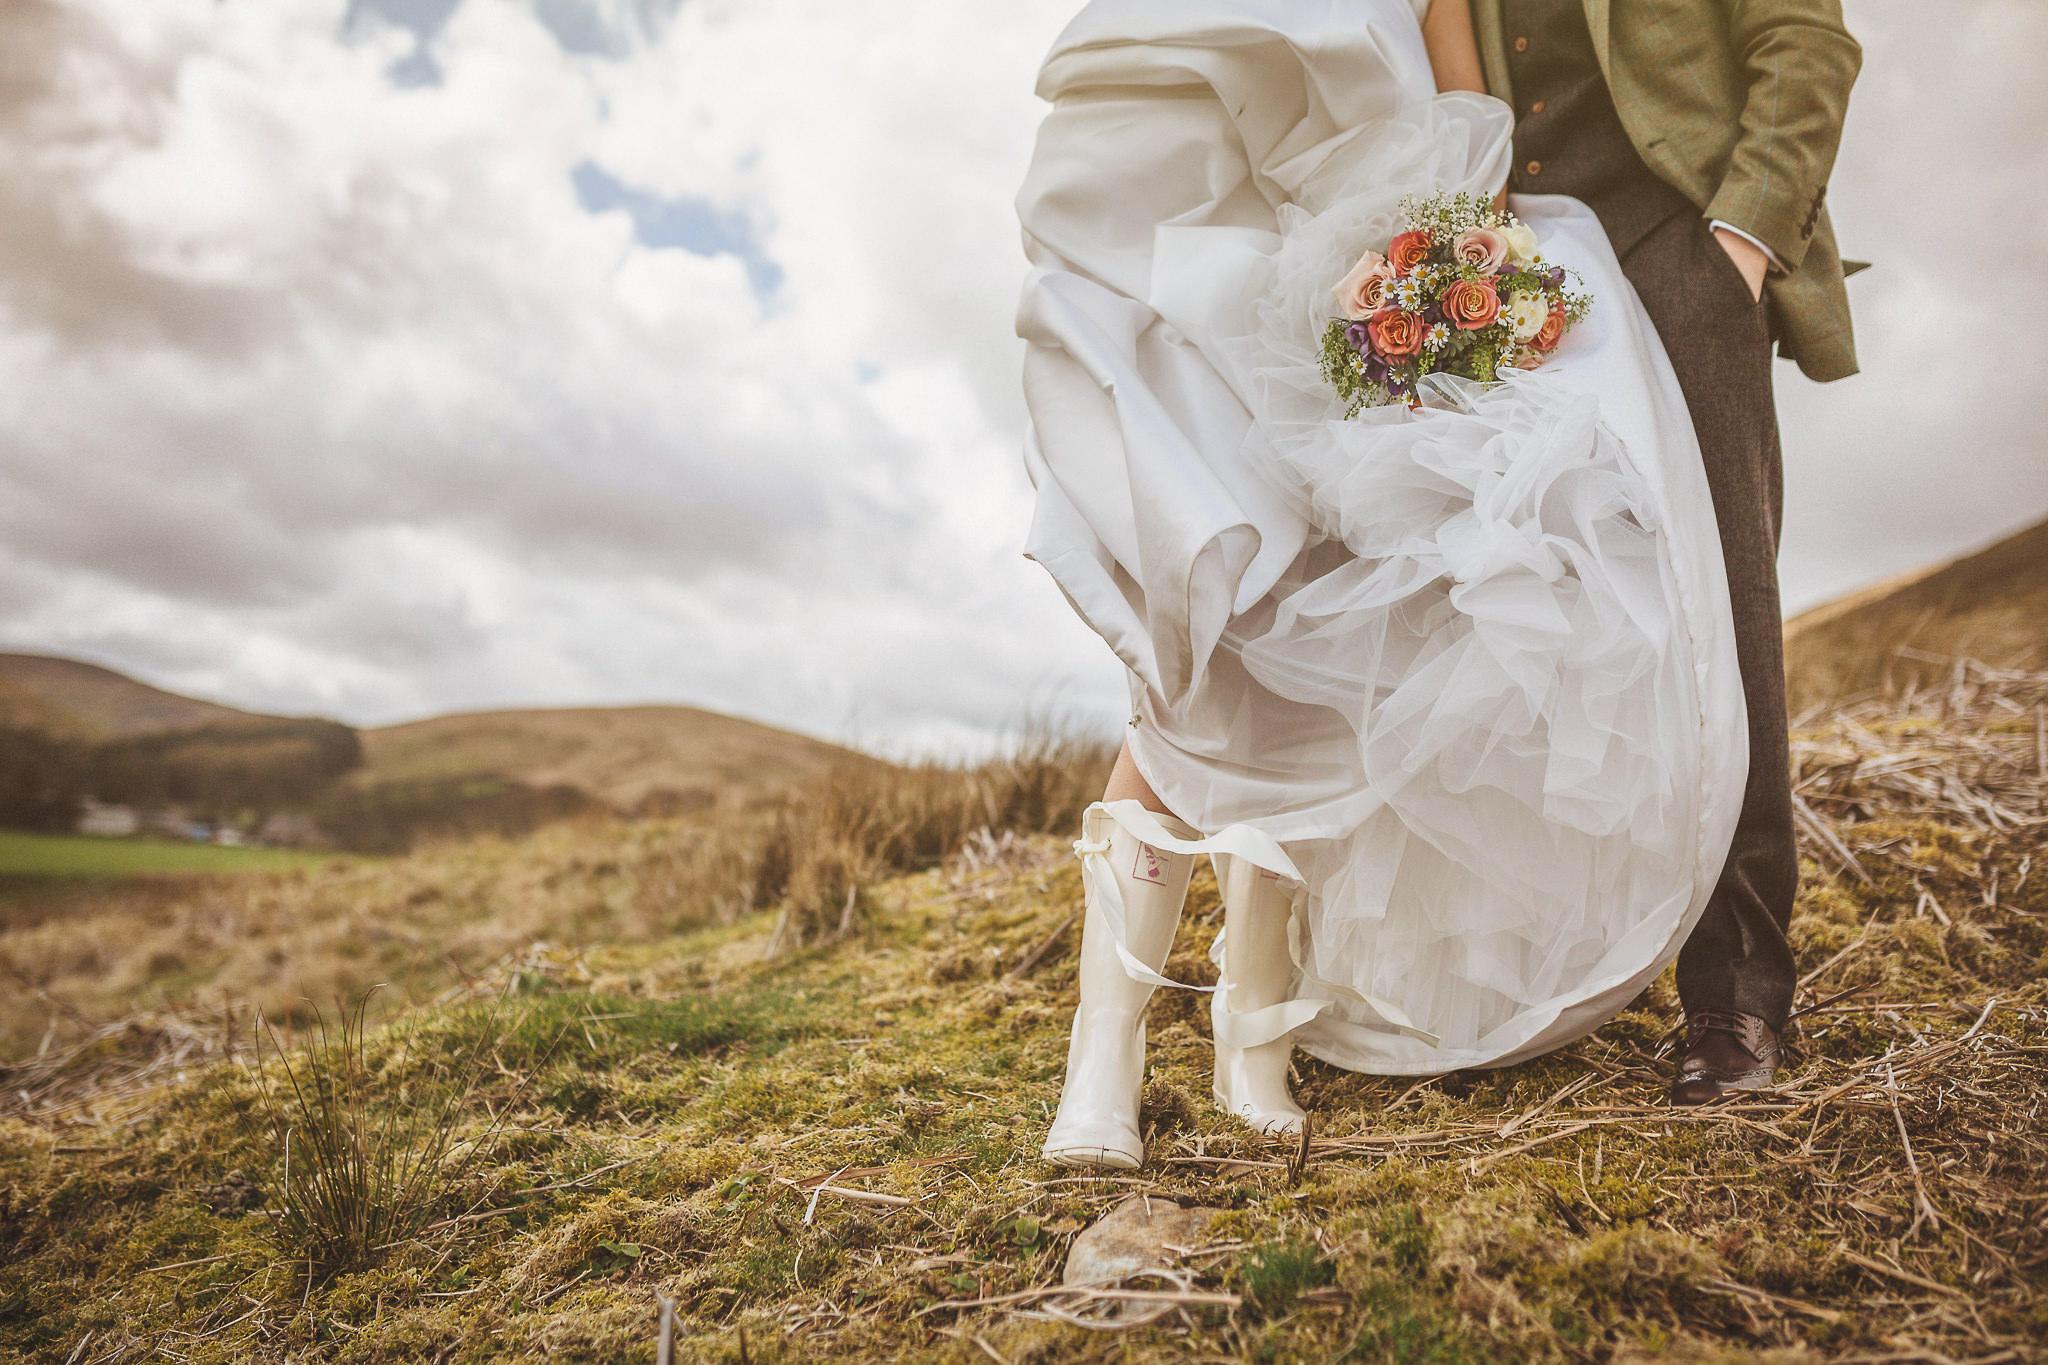 Lancashire-Creative-natural-documentary-wedding-photography-90058